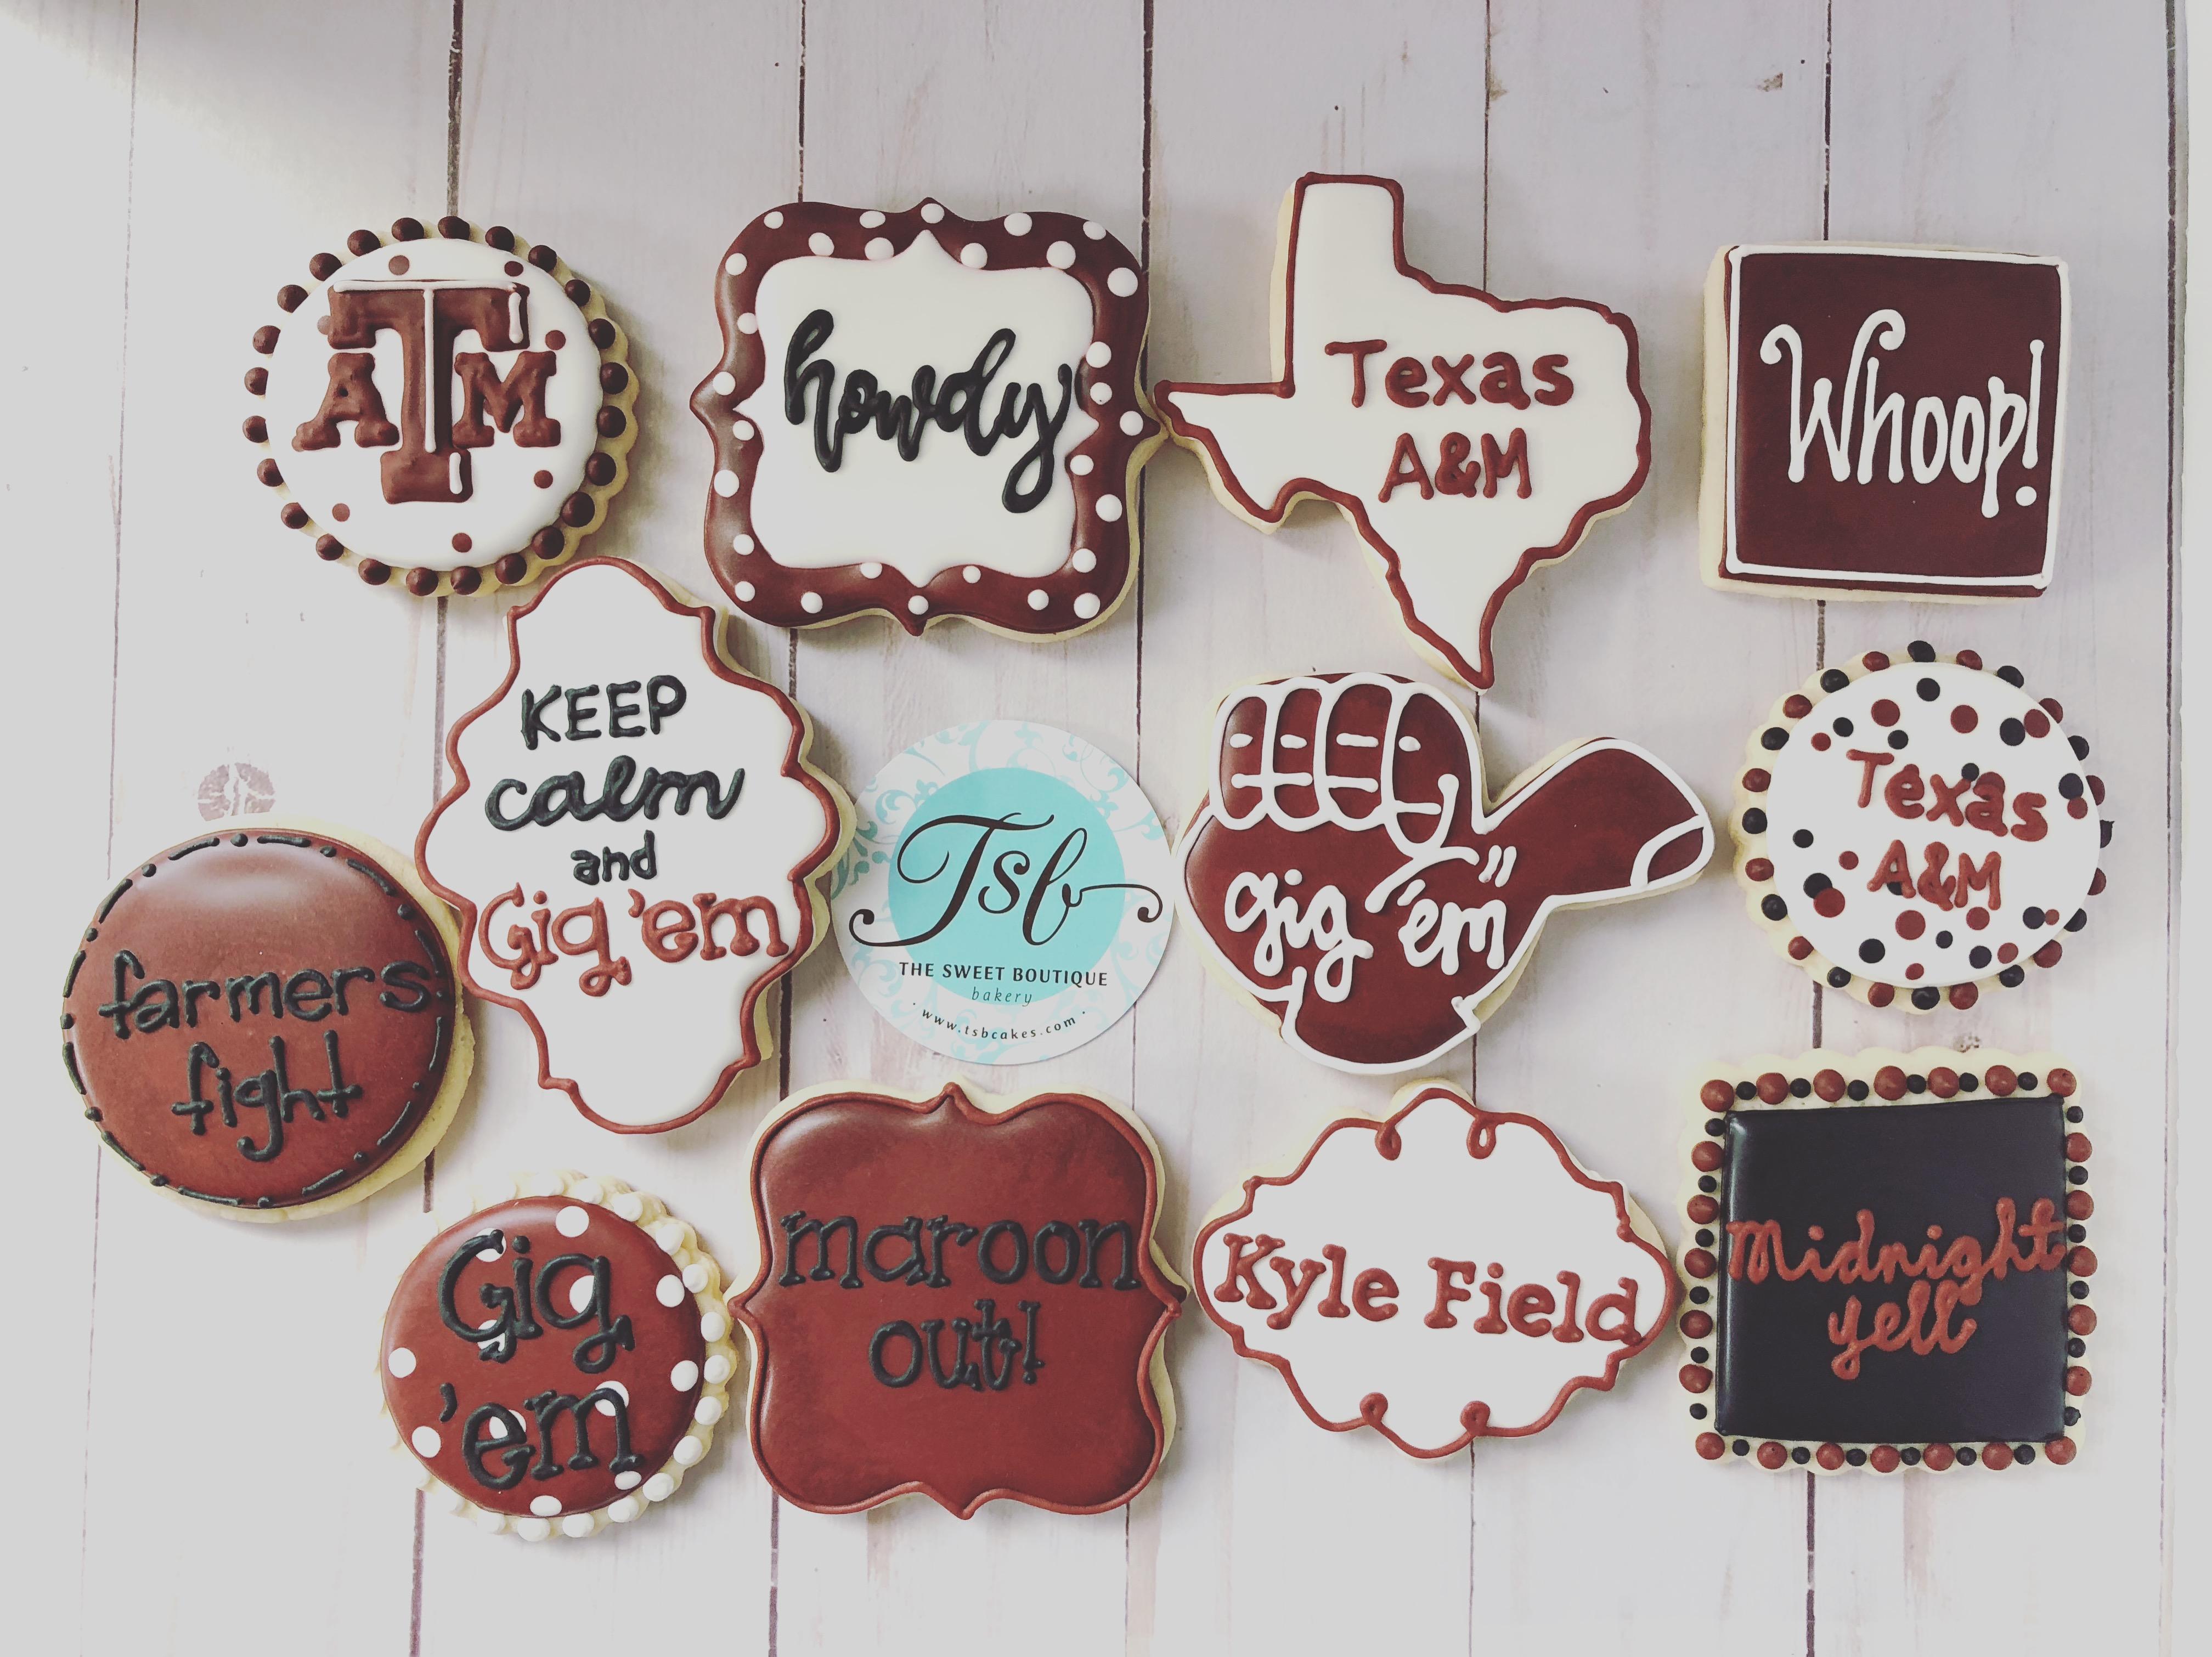 Texas Aggies Cookies